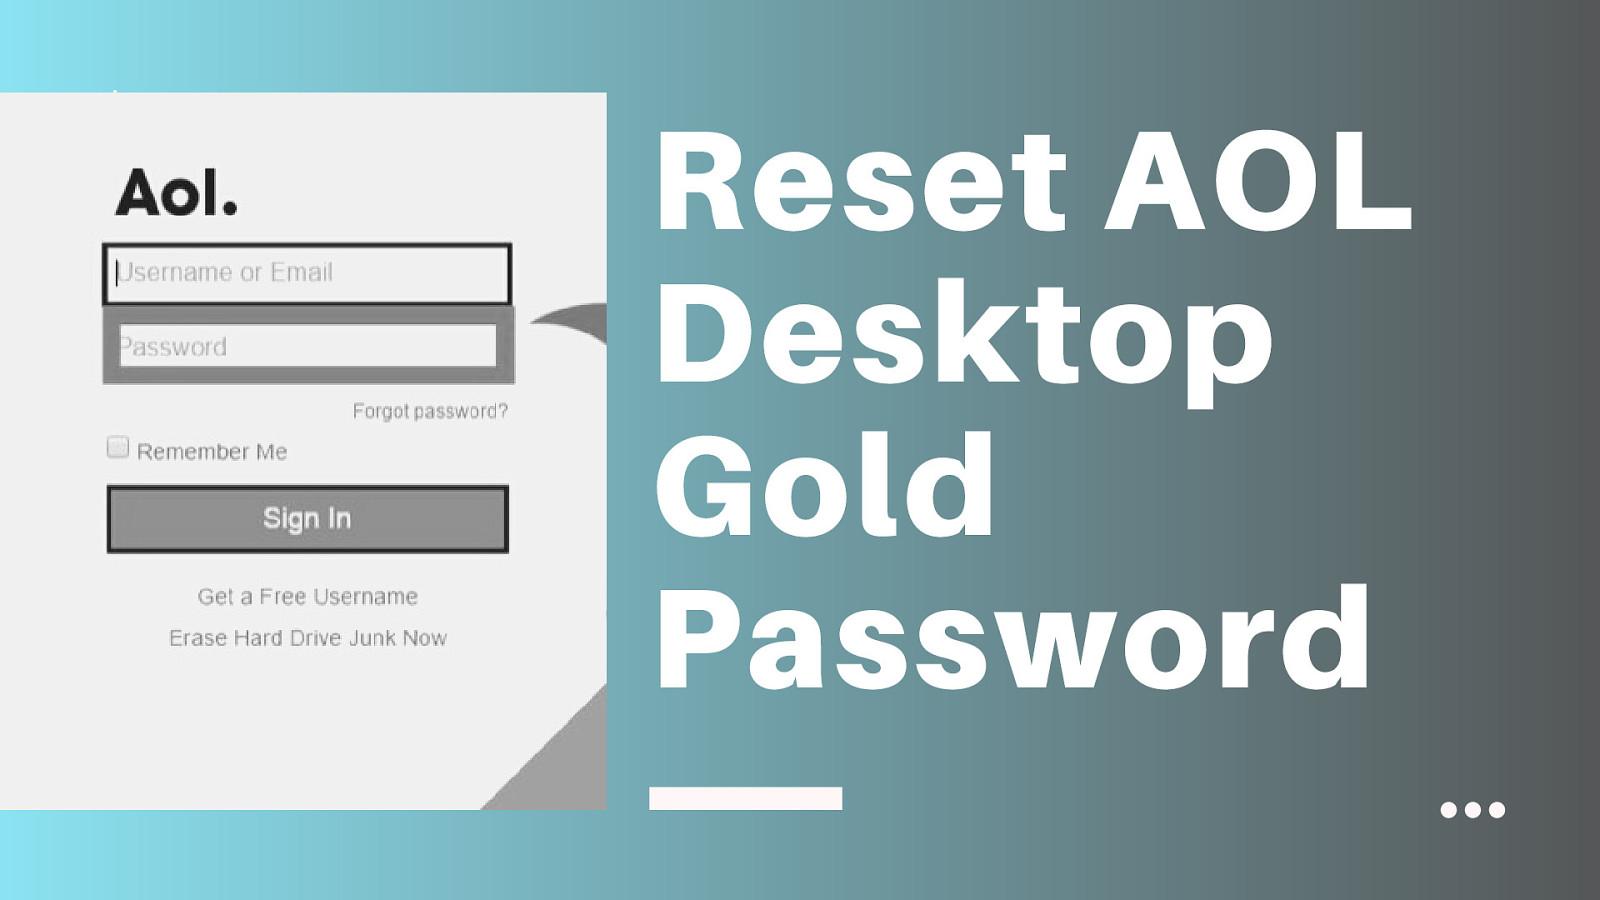 Recover AOL Desktop Gold Password | Troubleshoot